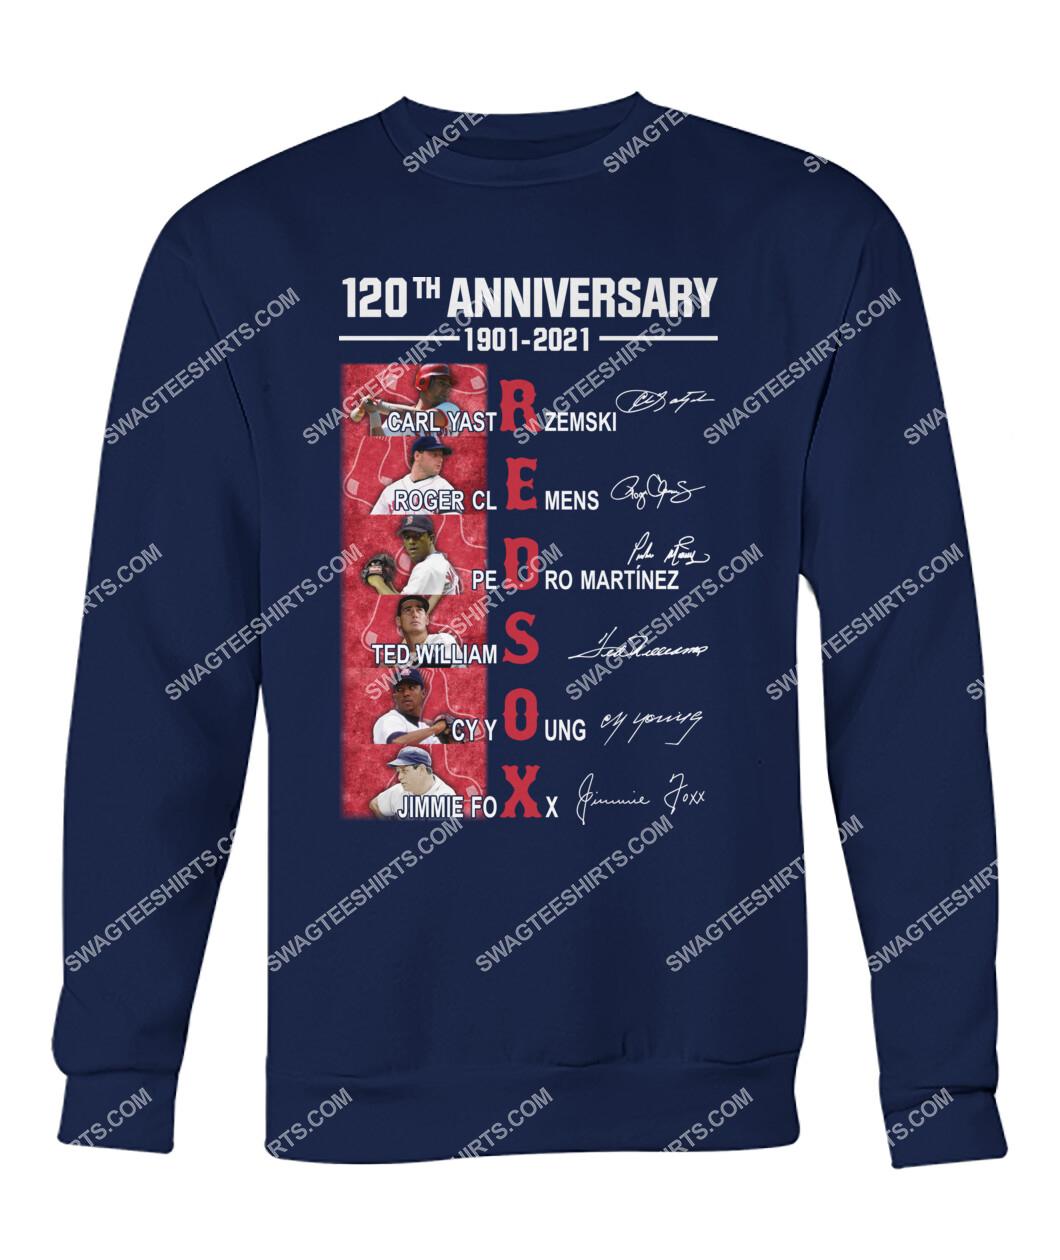 the boston red sox 120th anniversary 1901 2021 signatures mlb sweatshirt 1